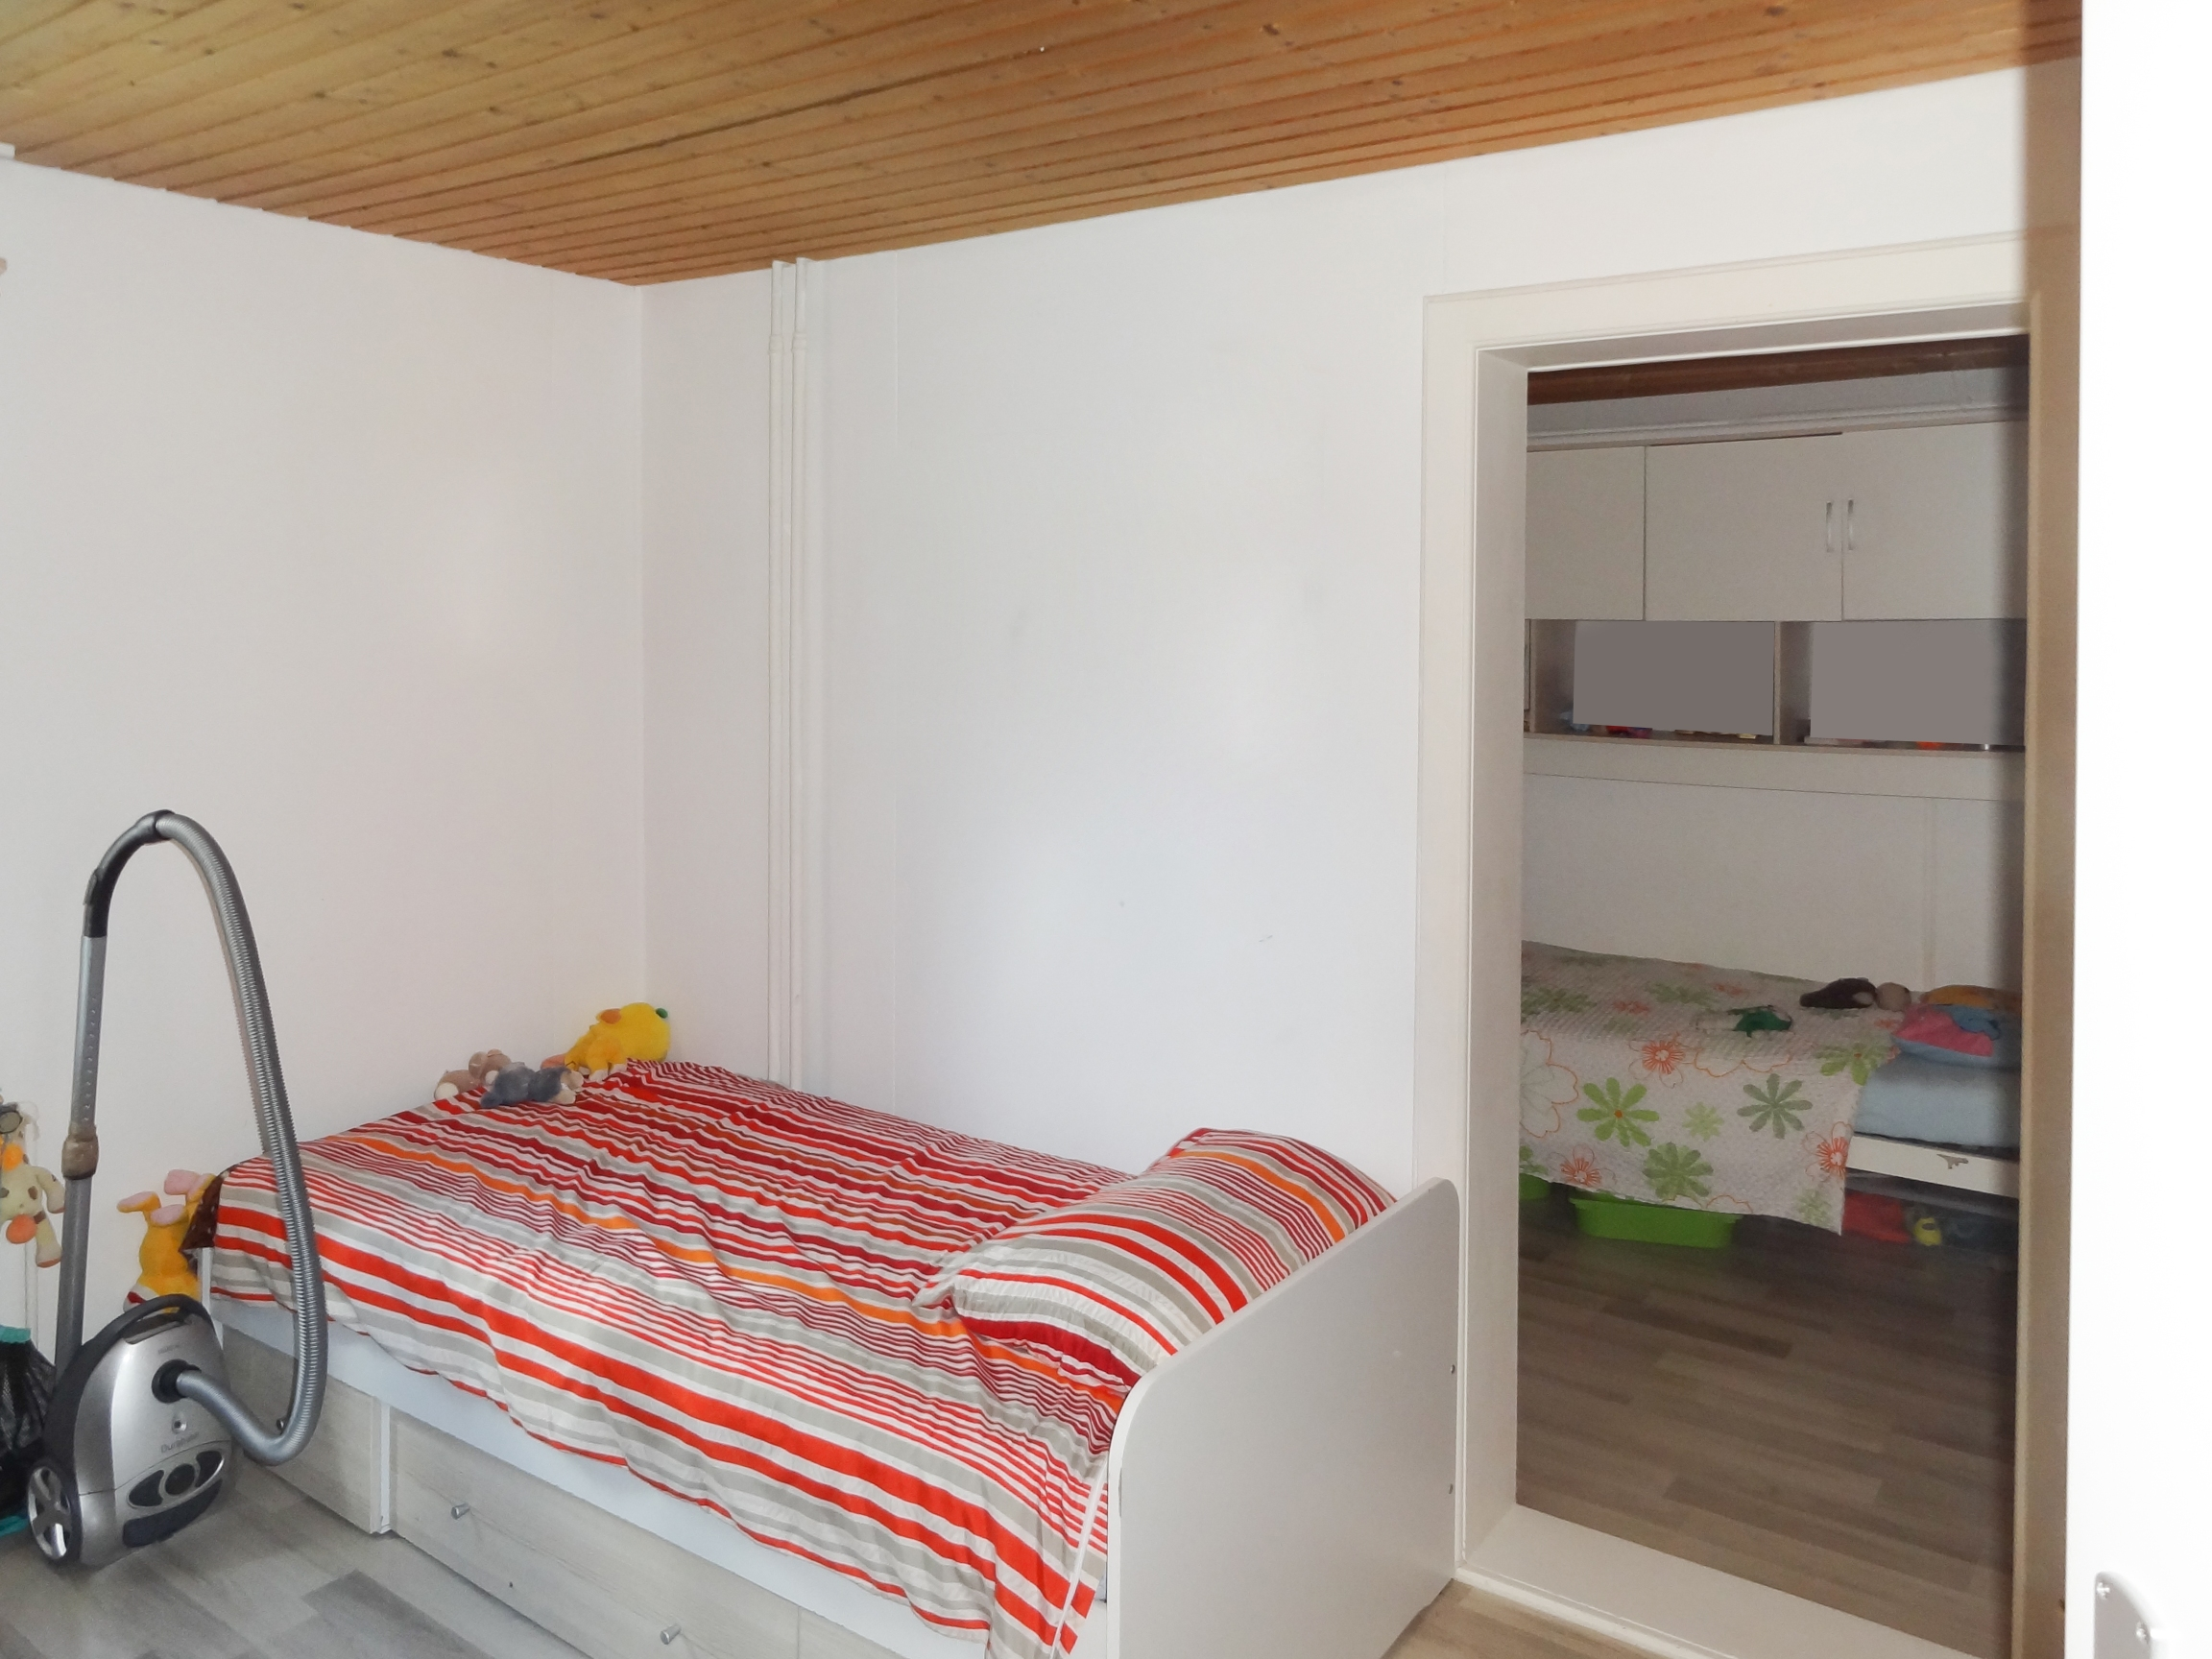 Kinderzimmer 2_resized_20190515_095810247.jpg